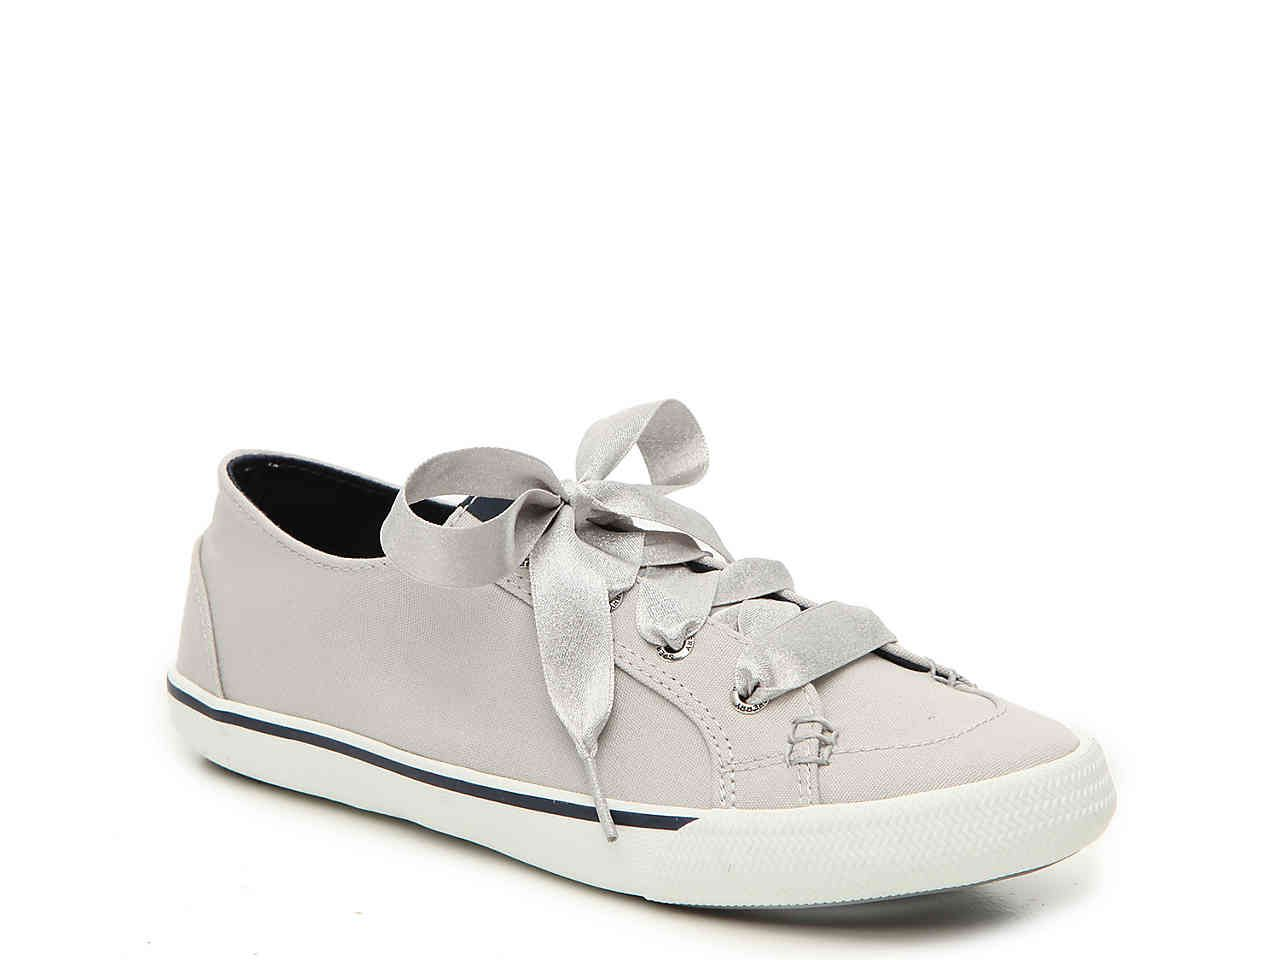 Sperry Lounge Slip-On Sneaker | Leather